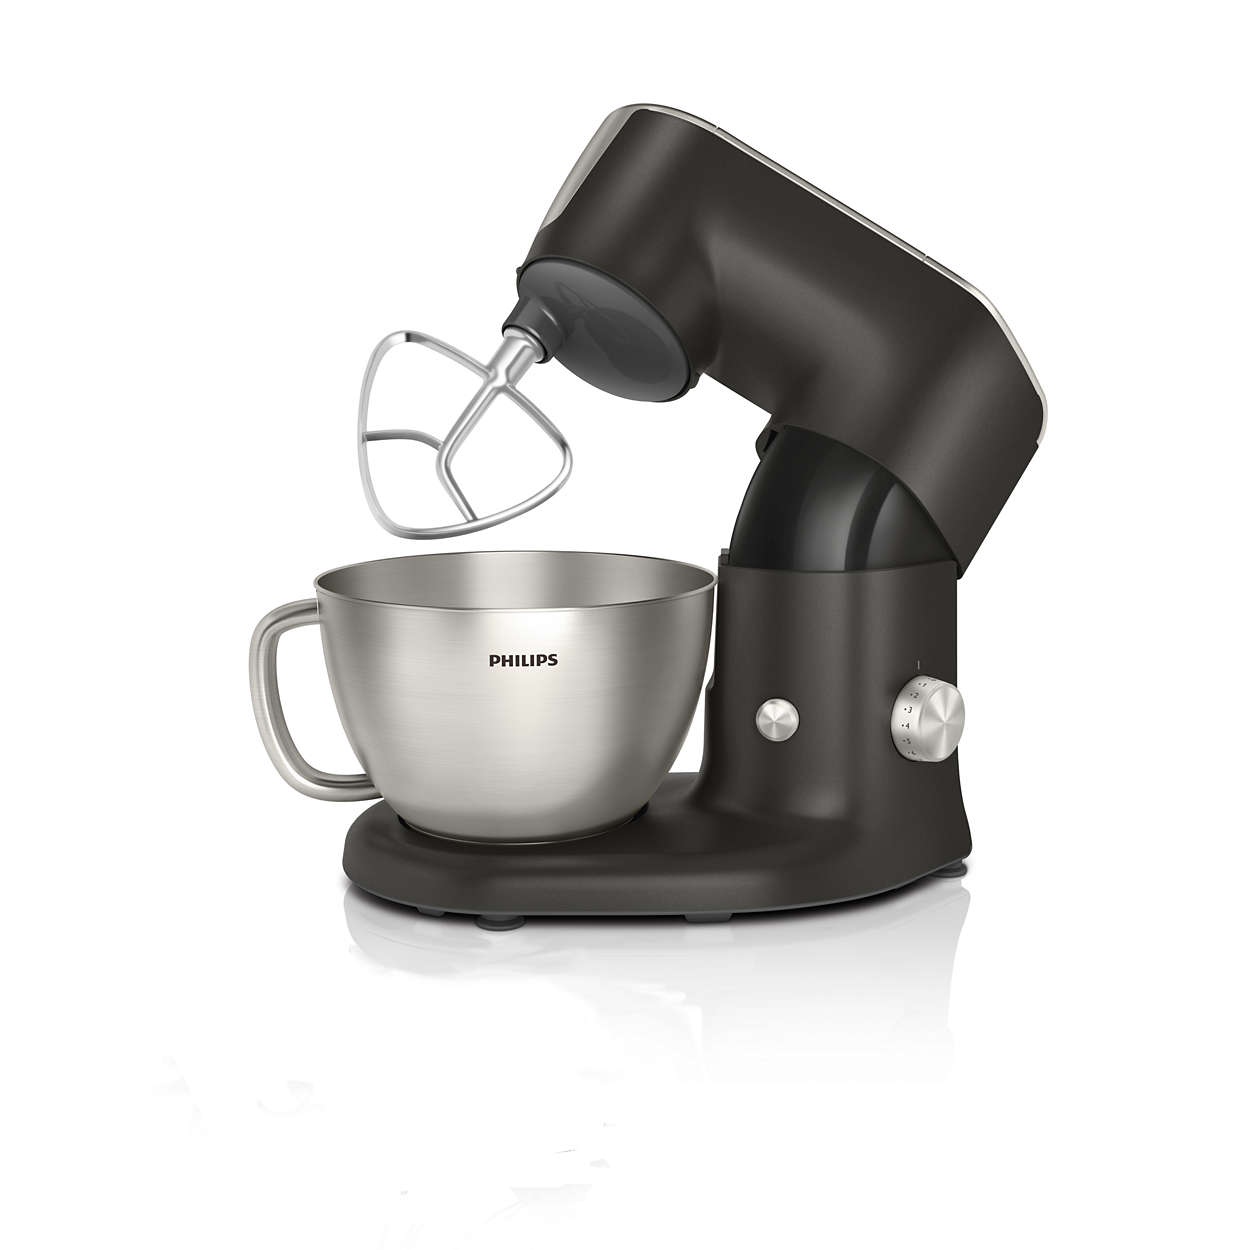 Avance collection robot de cuisine hr7978 00 philips for Robot cuisine philips